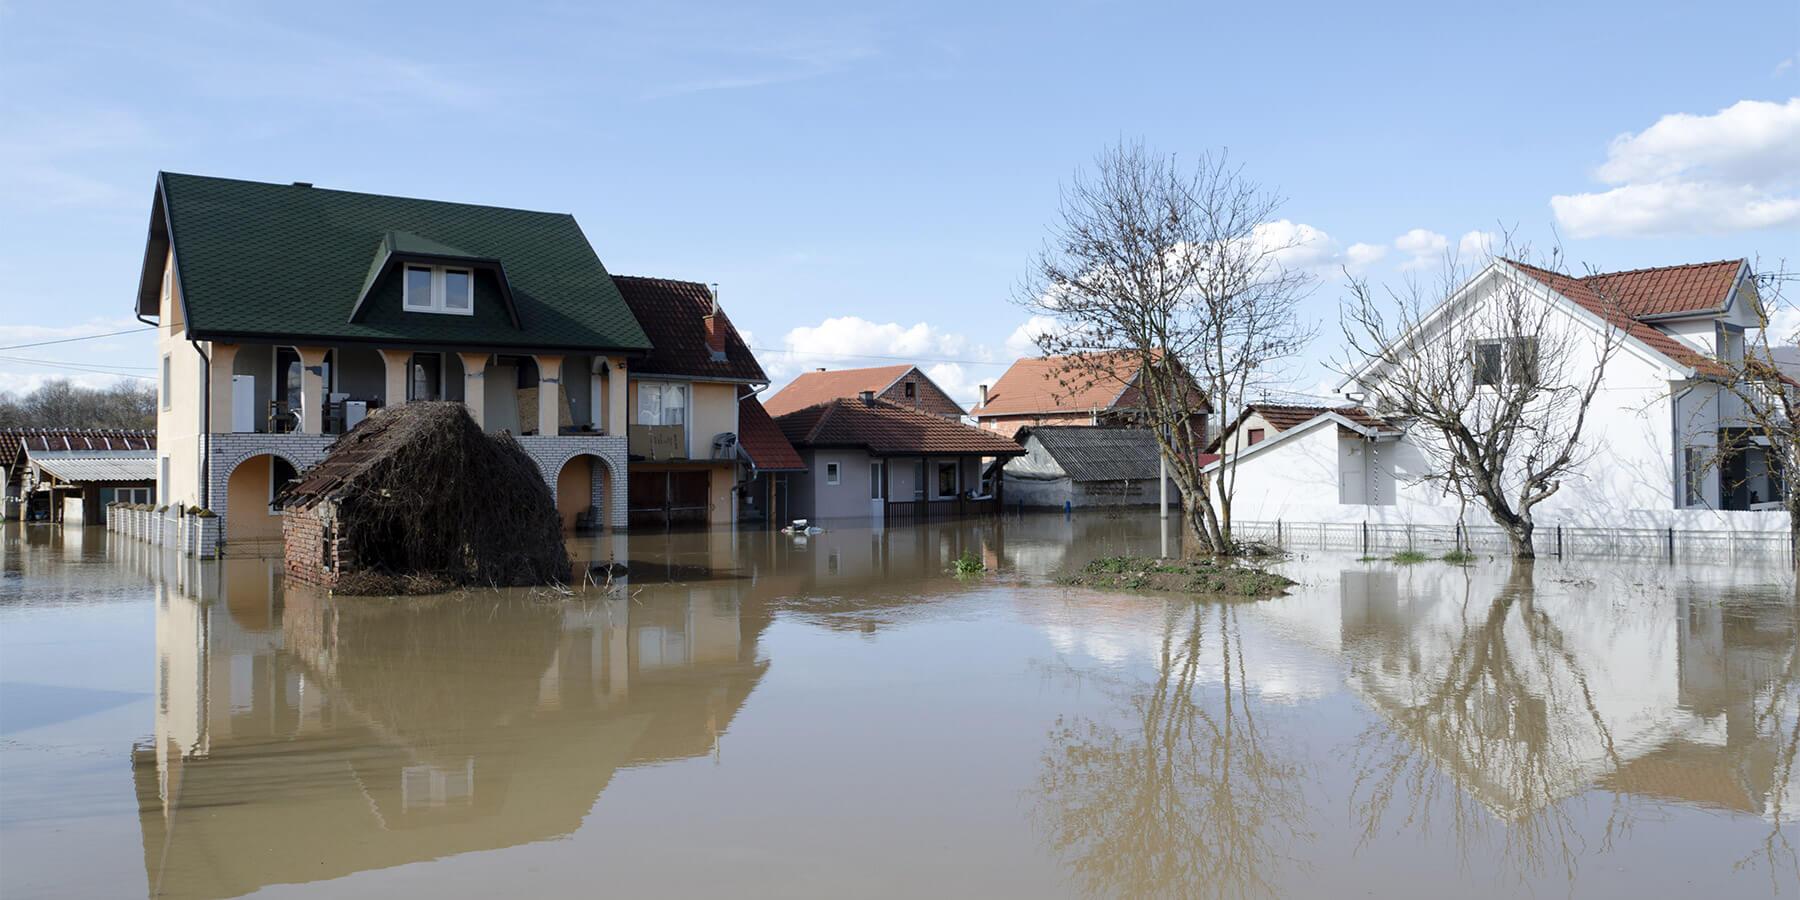 Flood Insurance Quotes South Carolina Flood Insurance  South Carolina Homeowners Flood